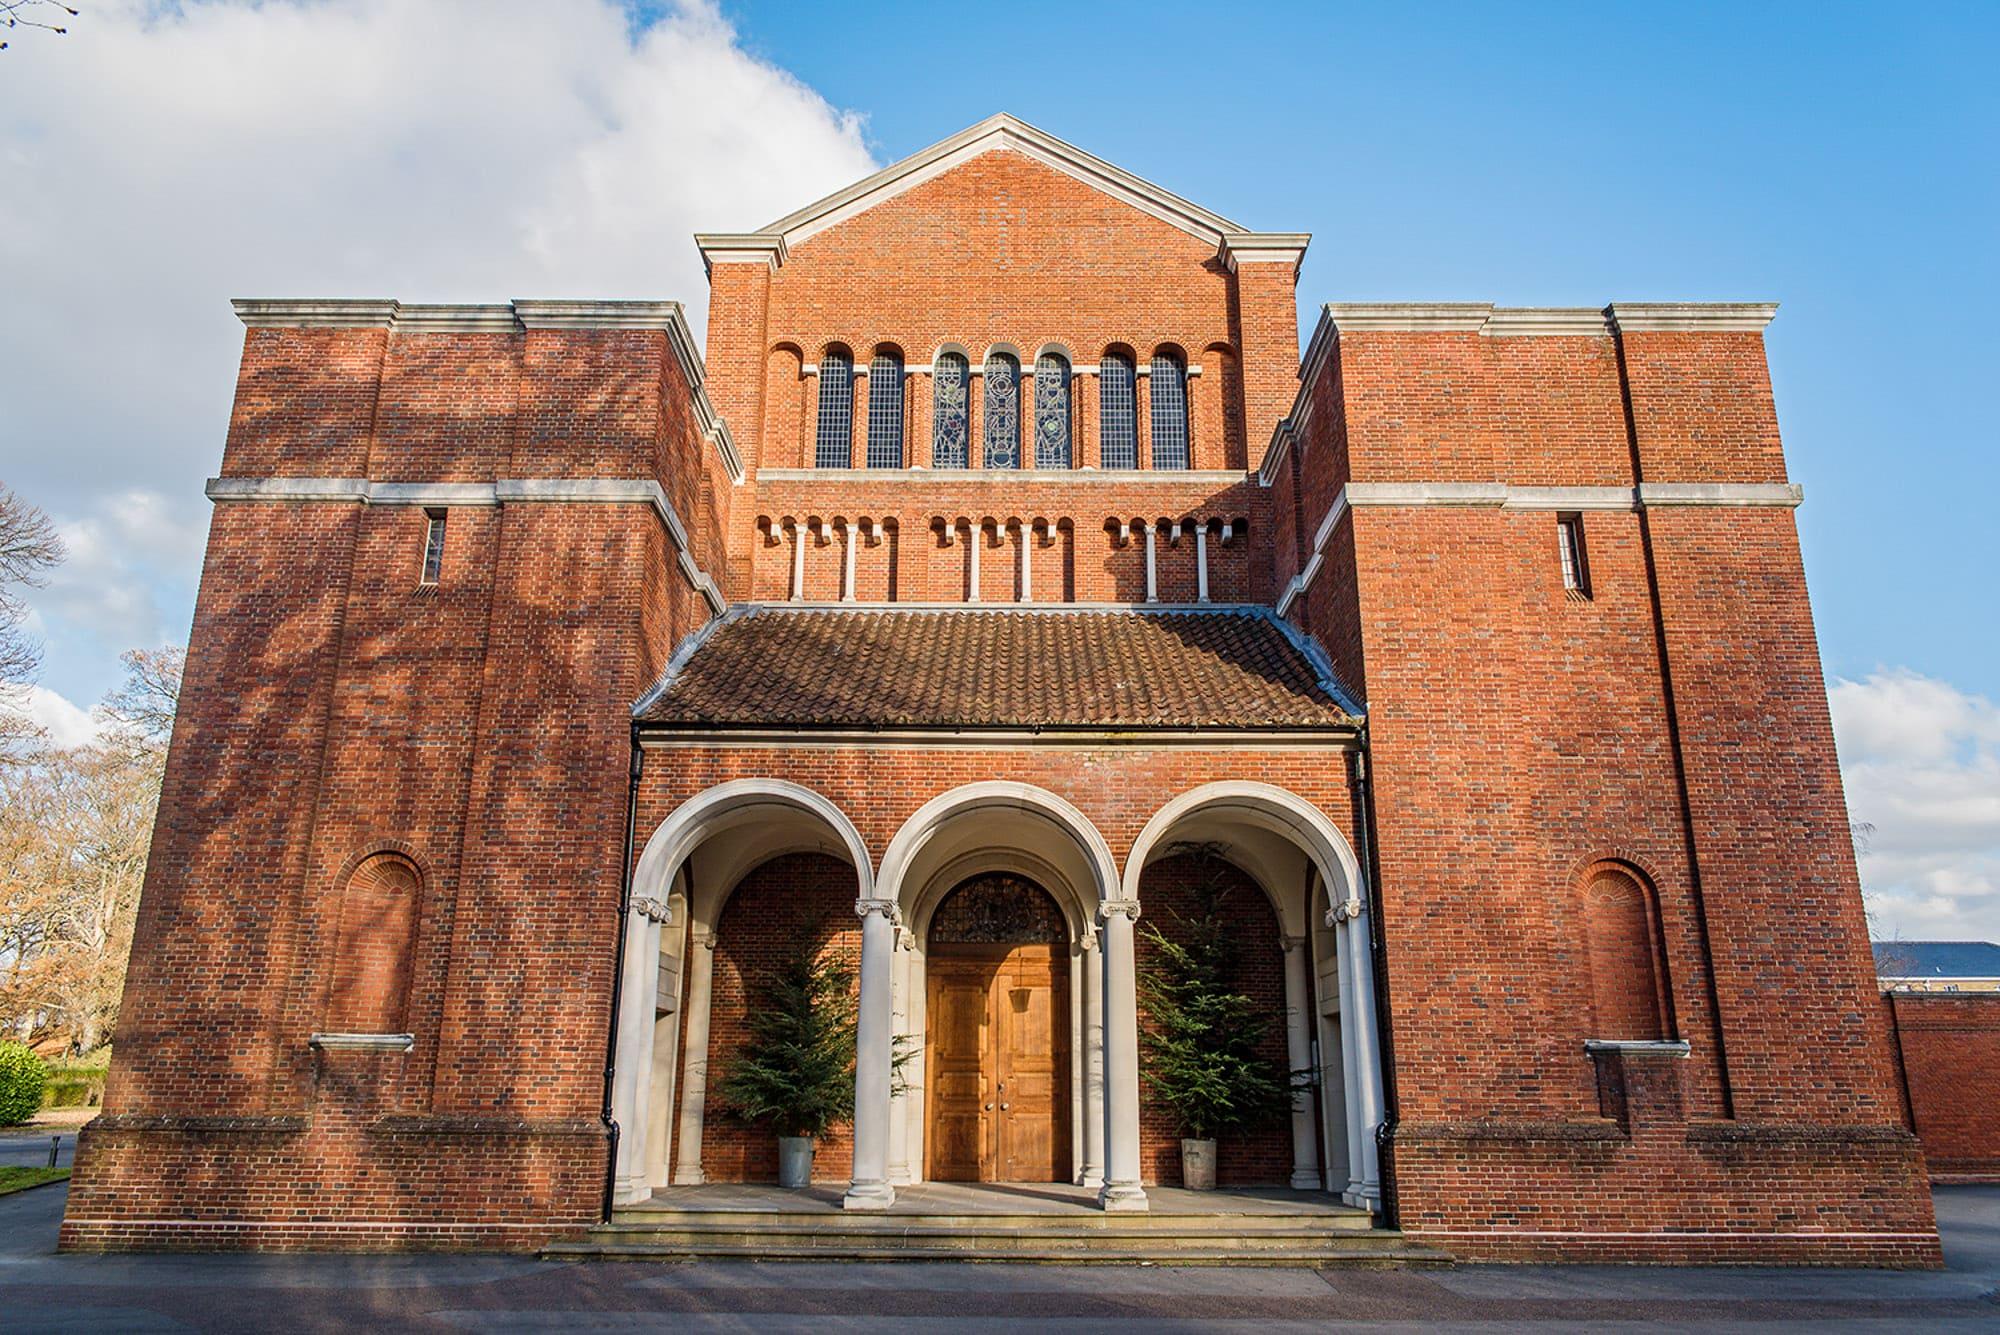 Royal Military Academy Sandhurst - Council Bluffs